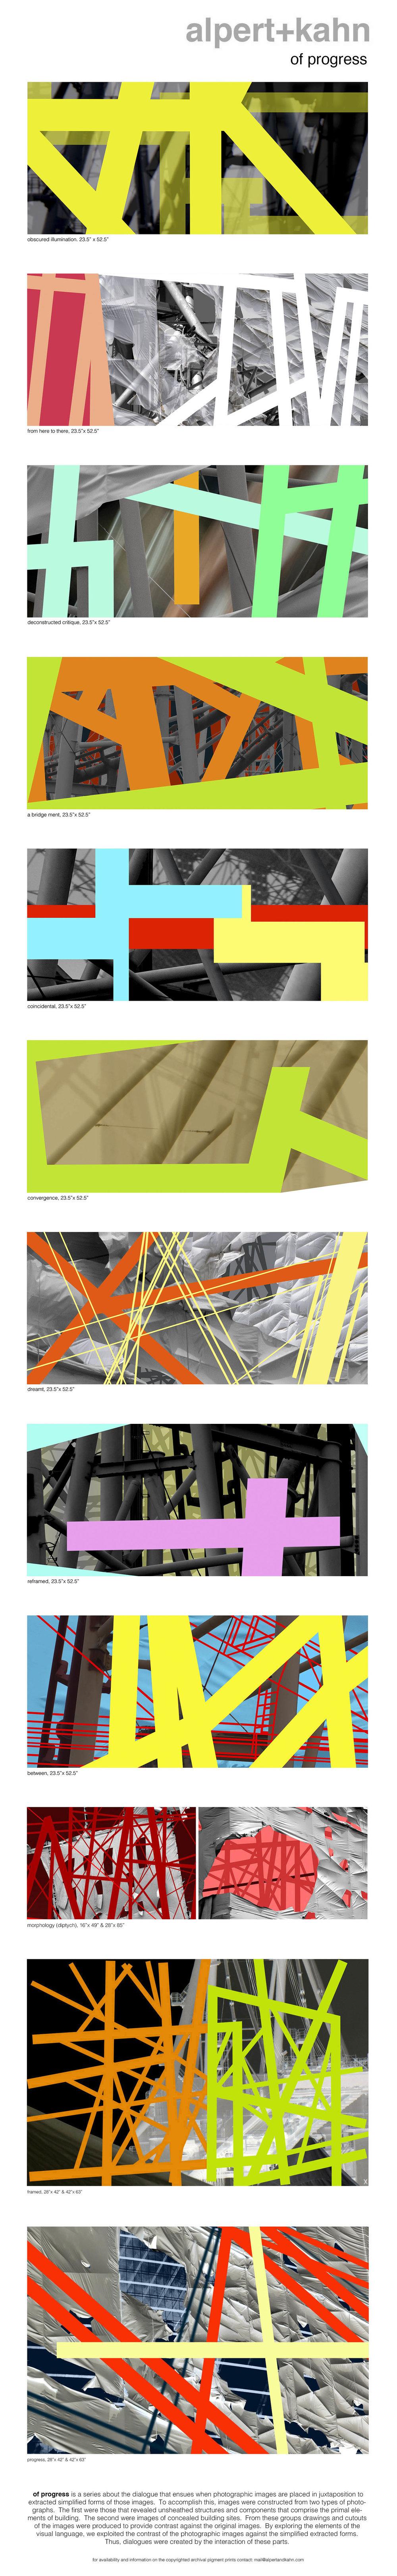 alpert+kahn (renee alpert & douglas kahn) new work-of progress.jpg